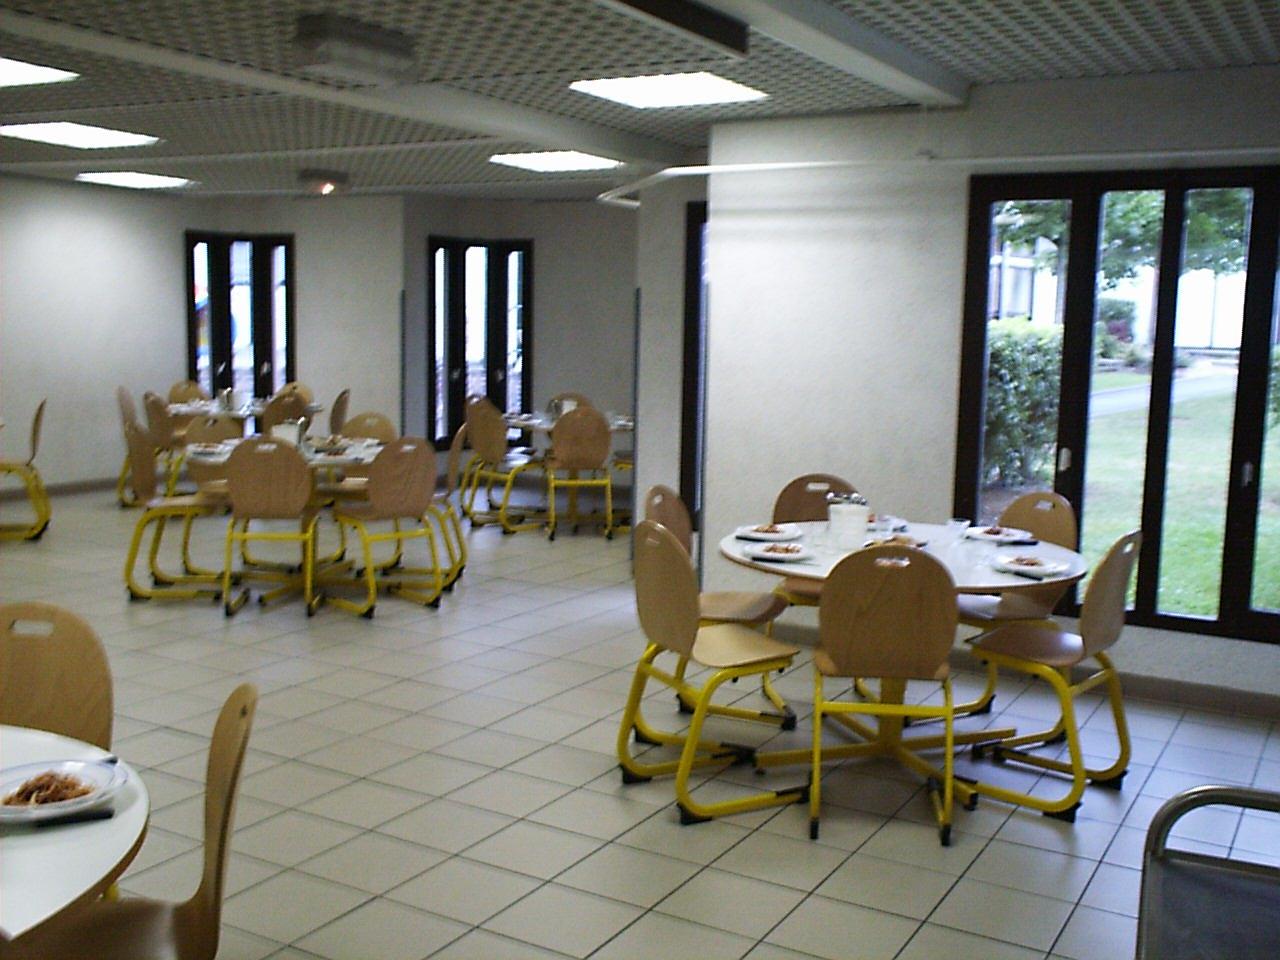 Restaurant scolaire01.jpg